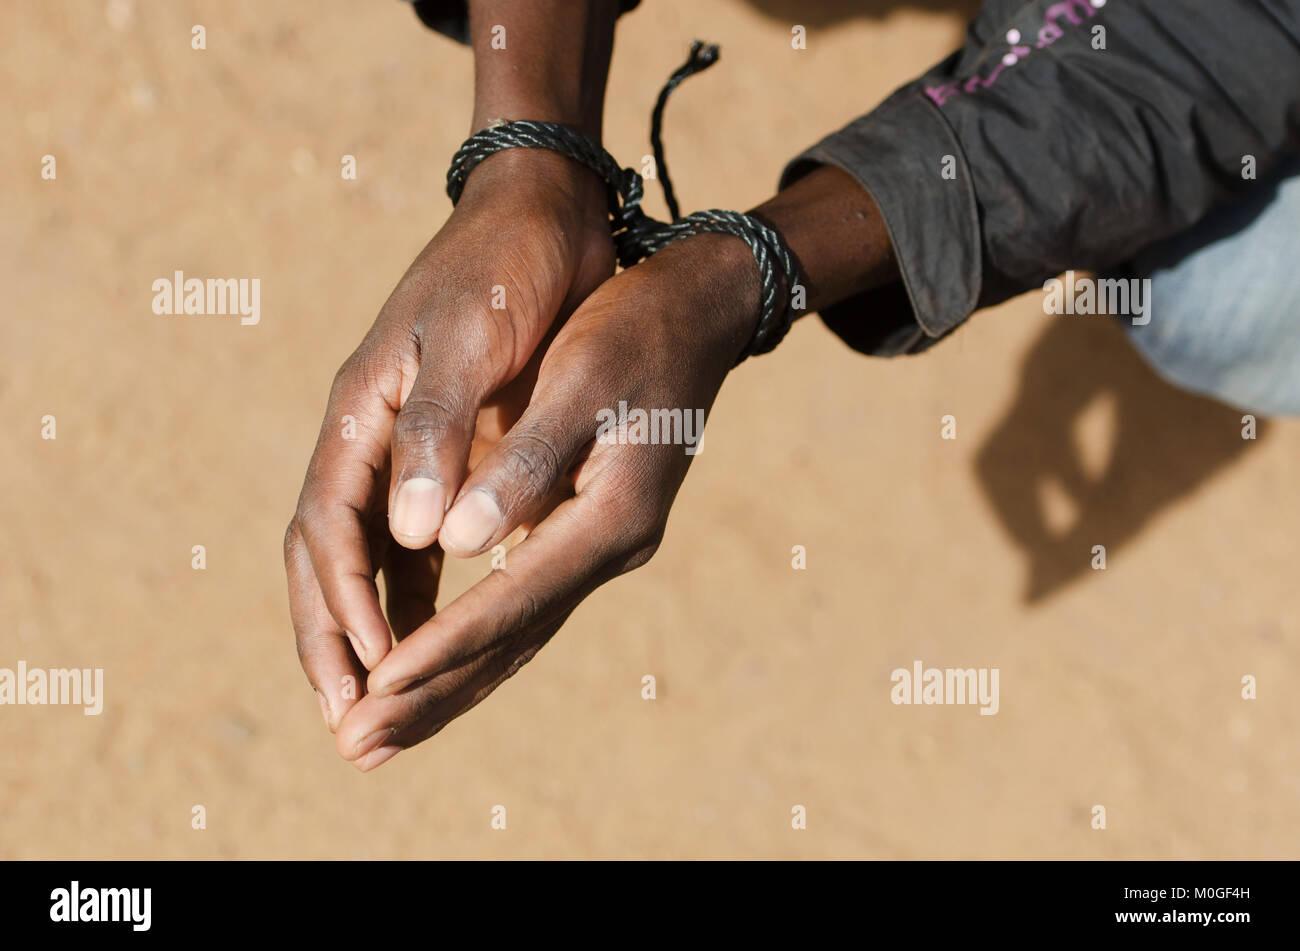 Black Man Slave Refugee Symbol - Human Rights Issue - Stock Image